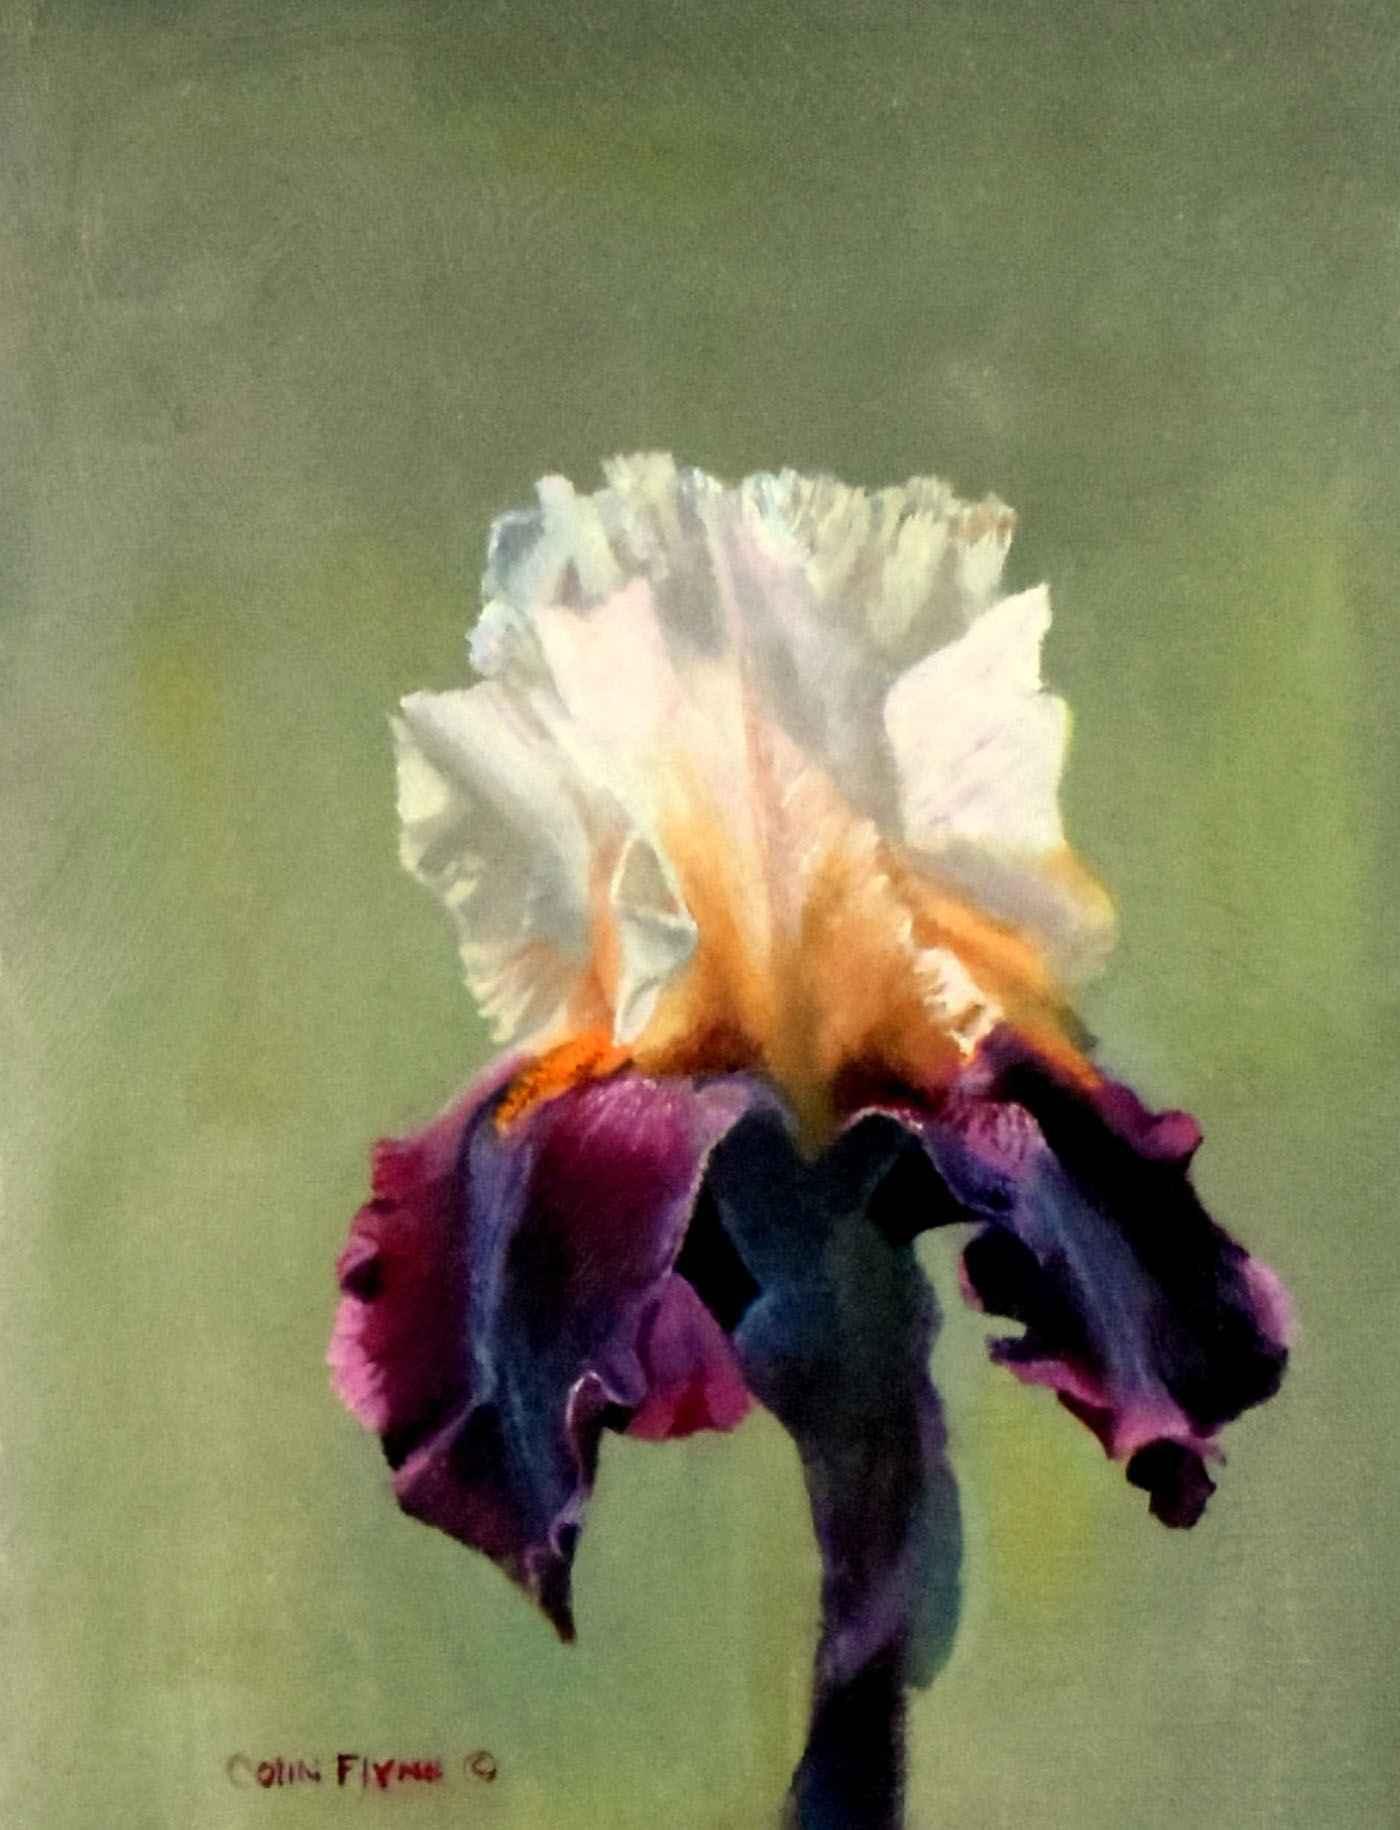 Iris 1 by  Colin Flynn - Masterpiece Online